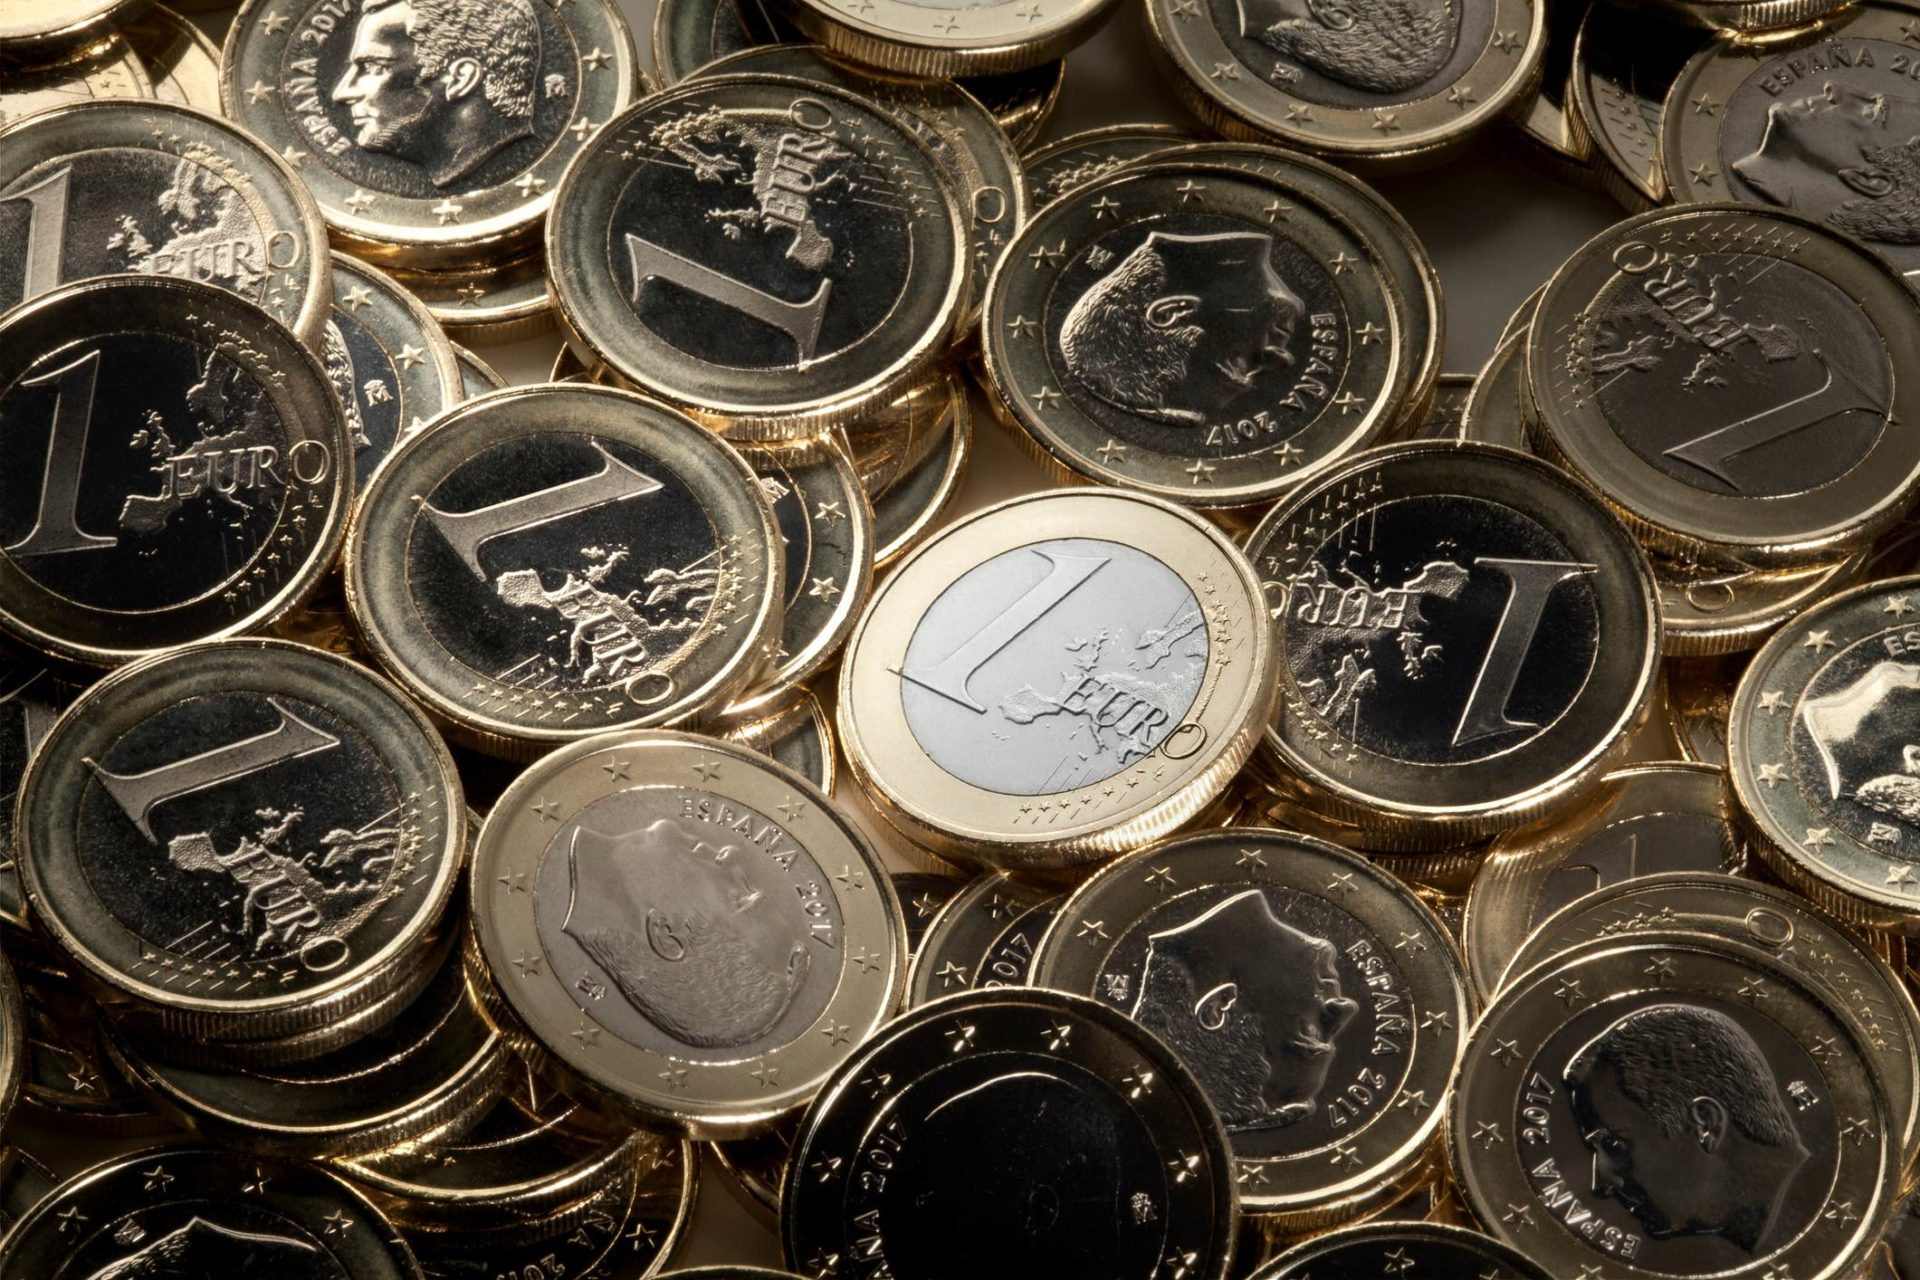 monedas finzanzas economia euro union europea recurso bbva